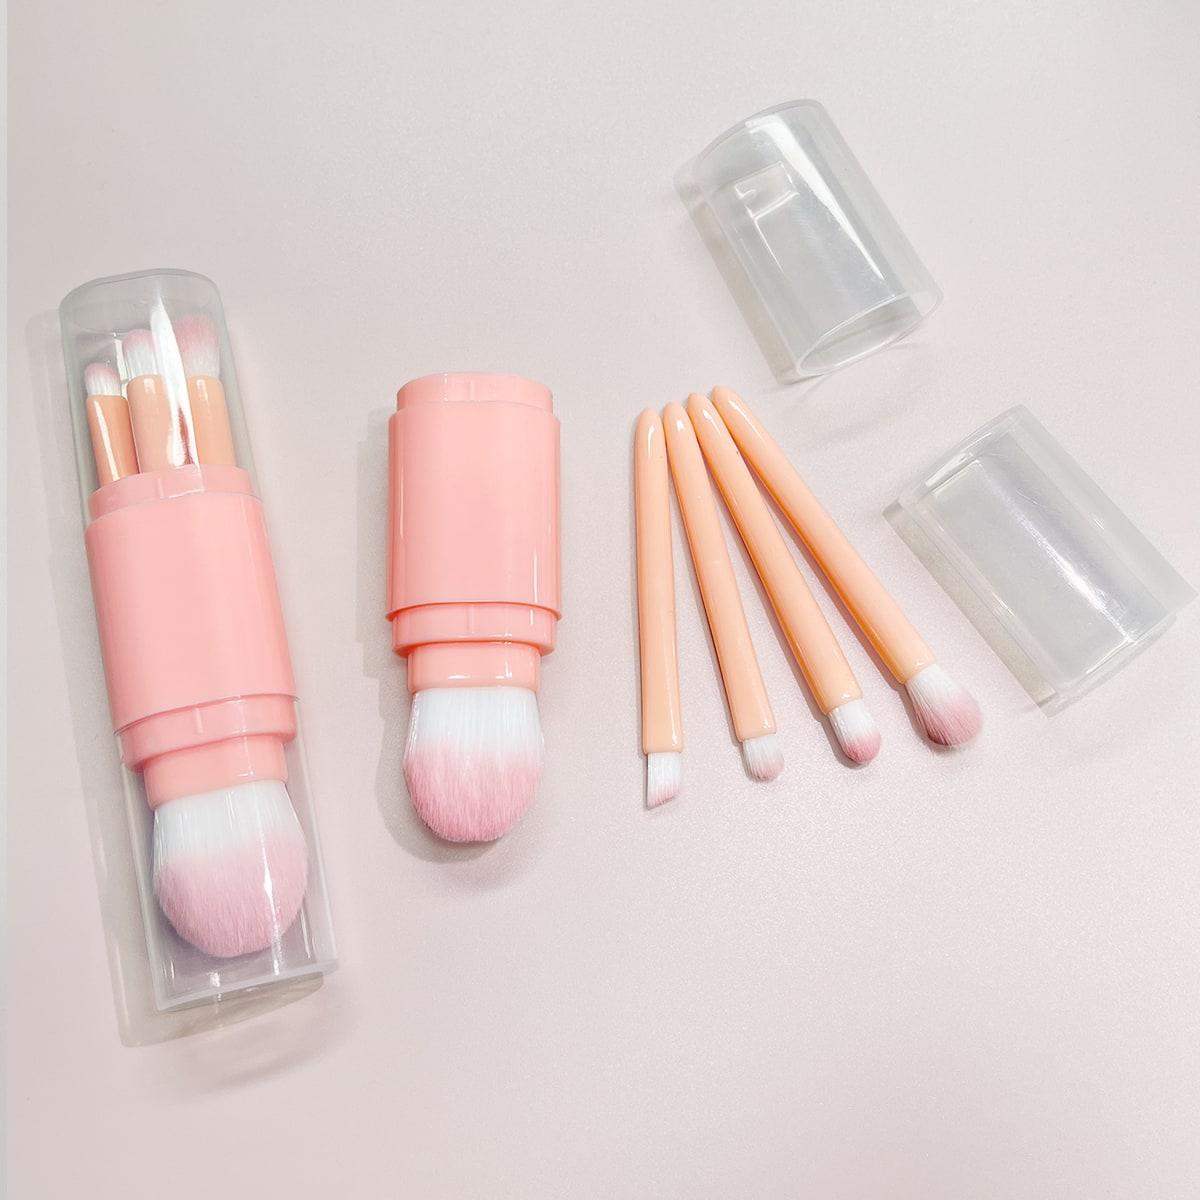 5pcs Multifunction Makeup Brush With Storage Box